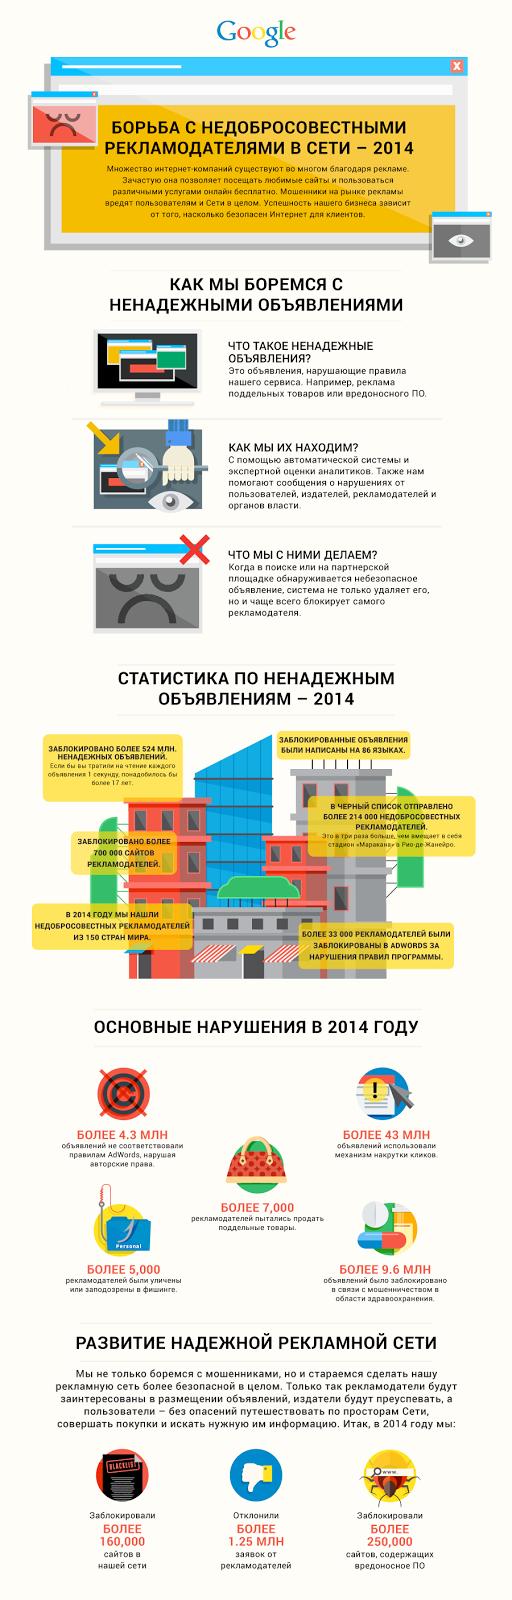 Google BadAds Infographic